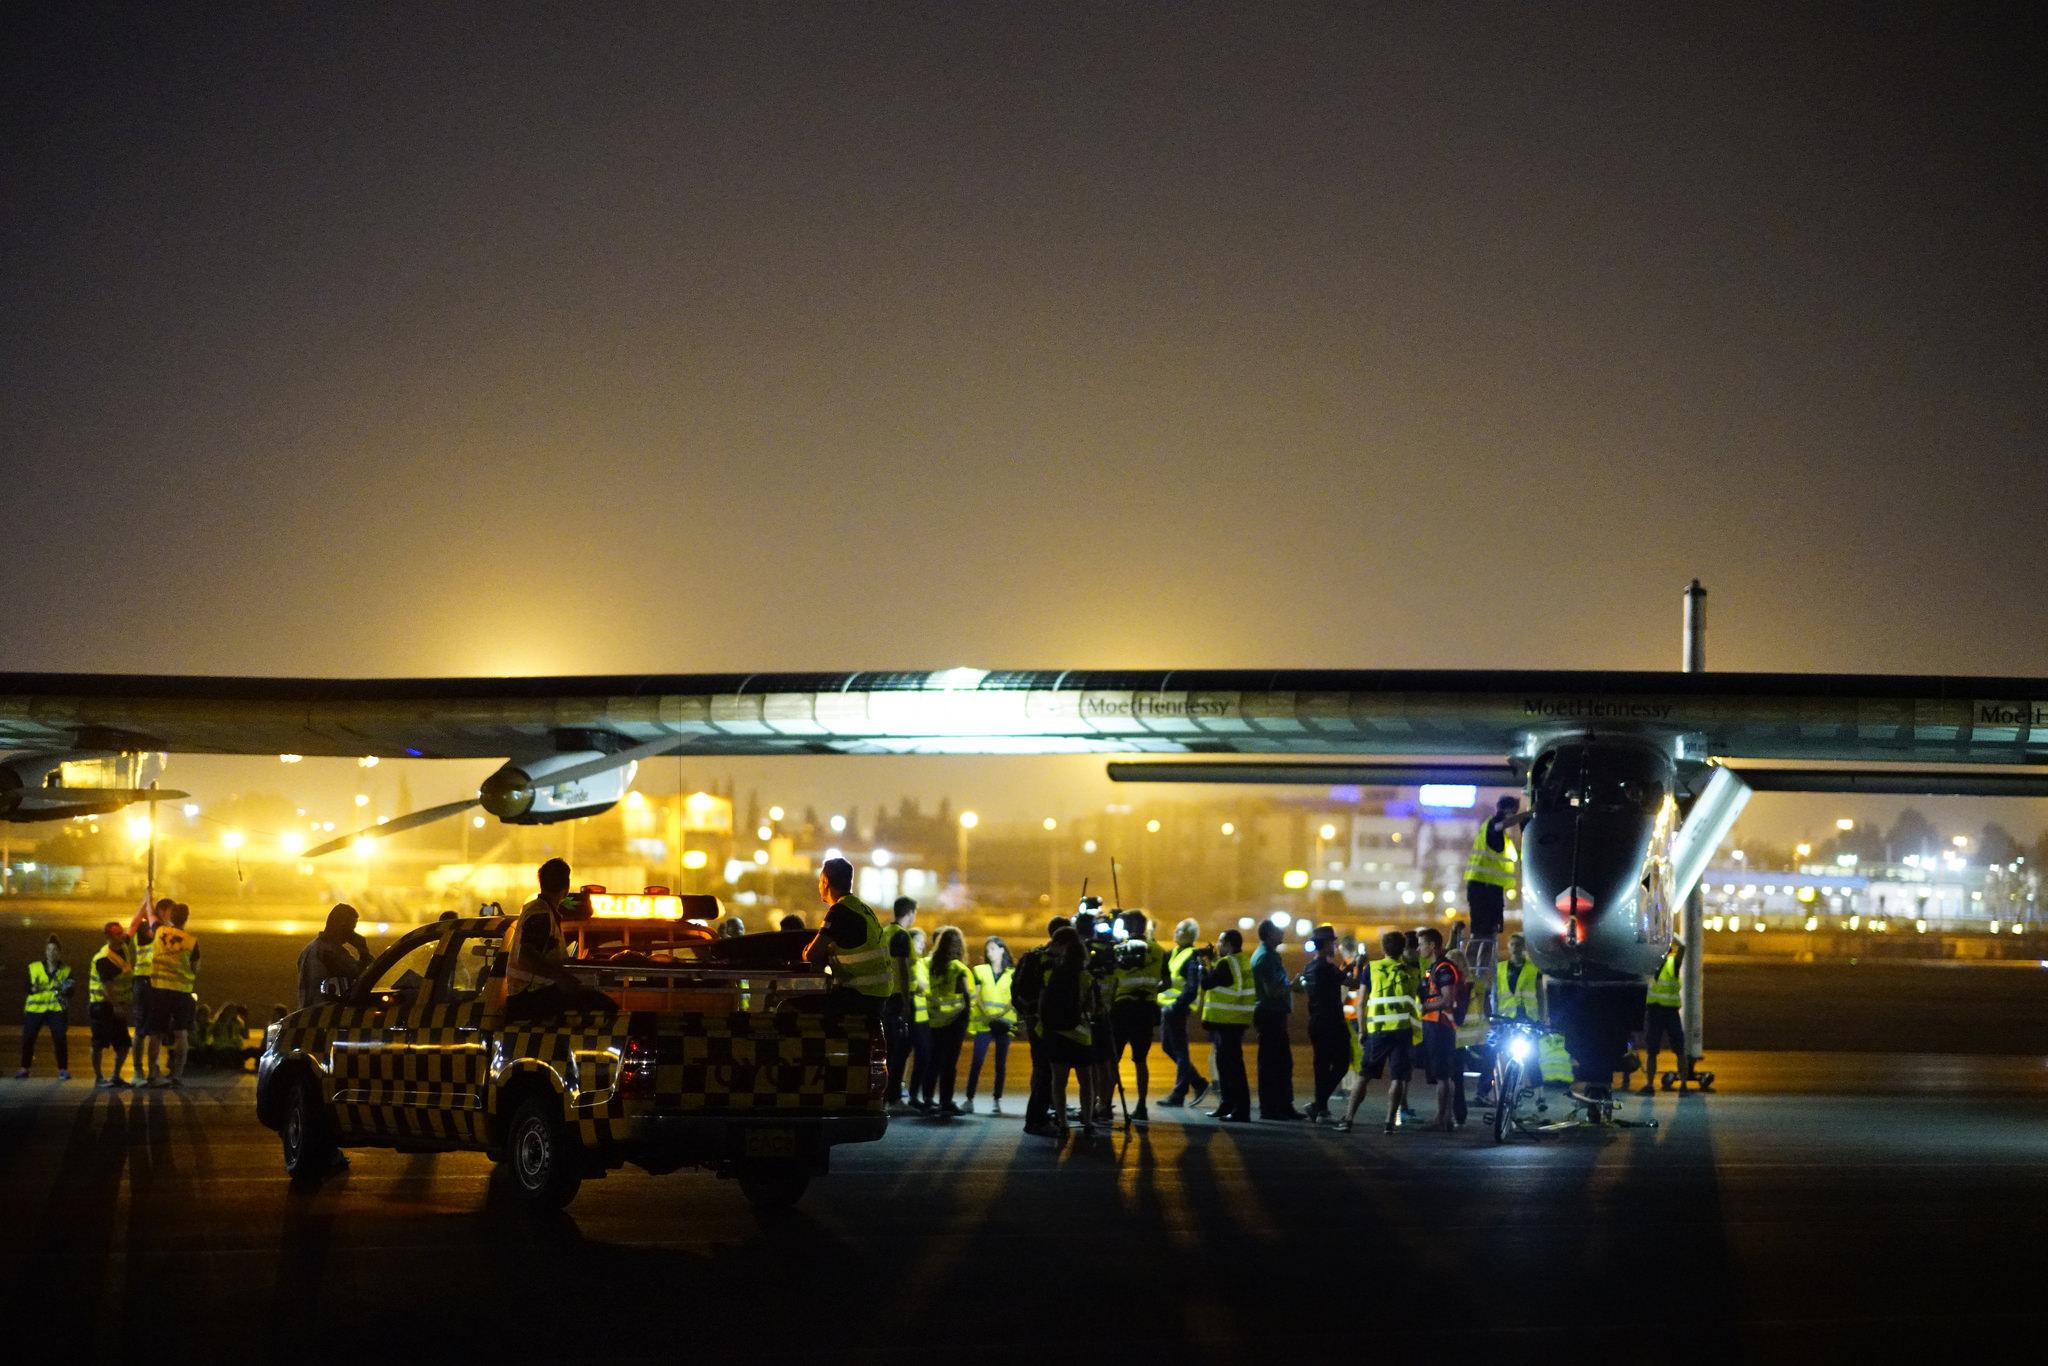 Journey's End: Solar Impulse Lands in Abu Dhabi